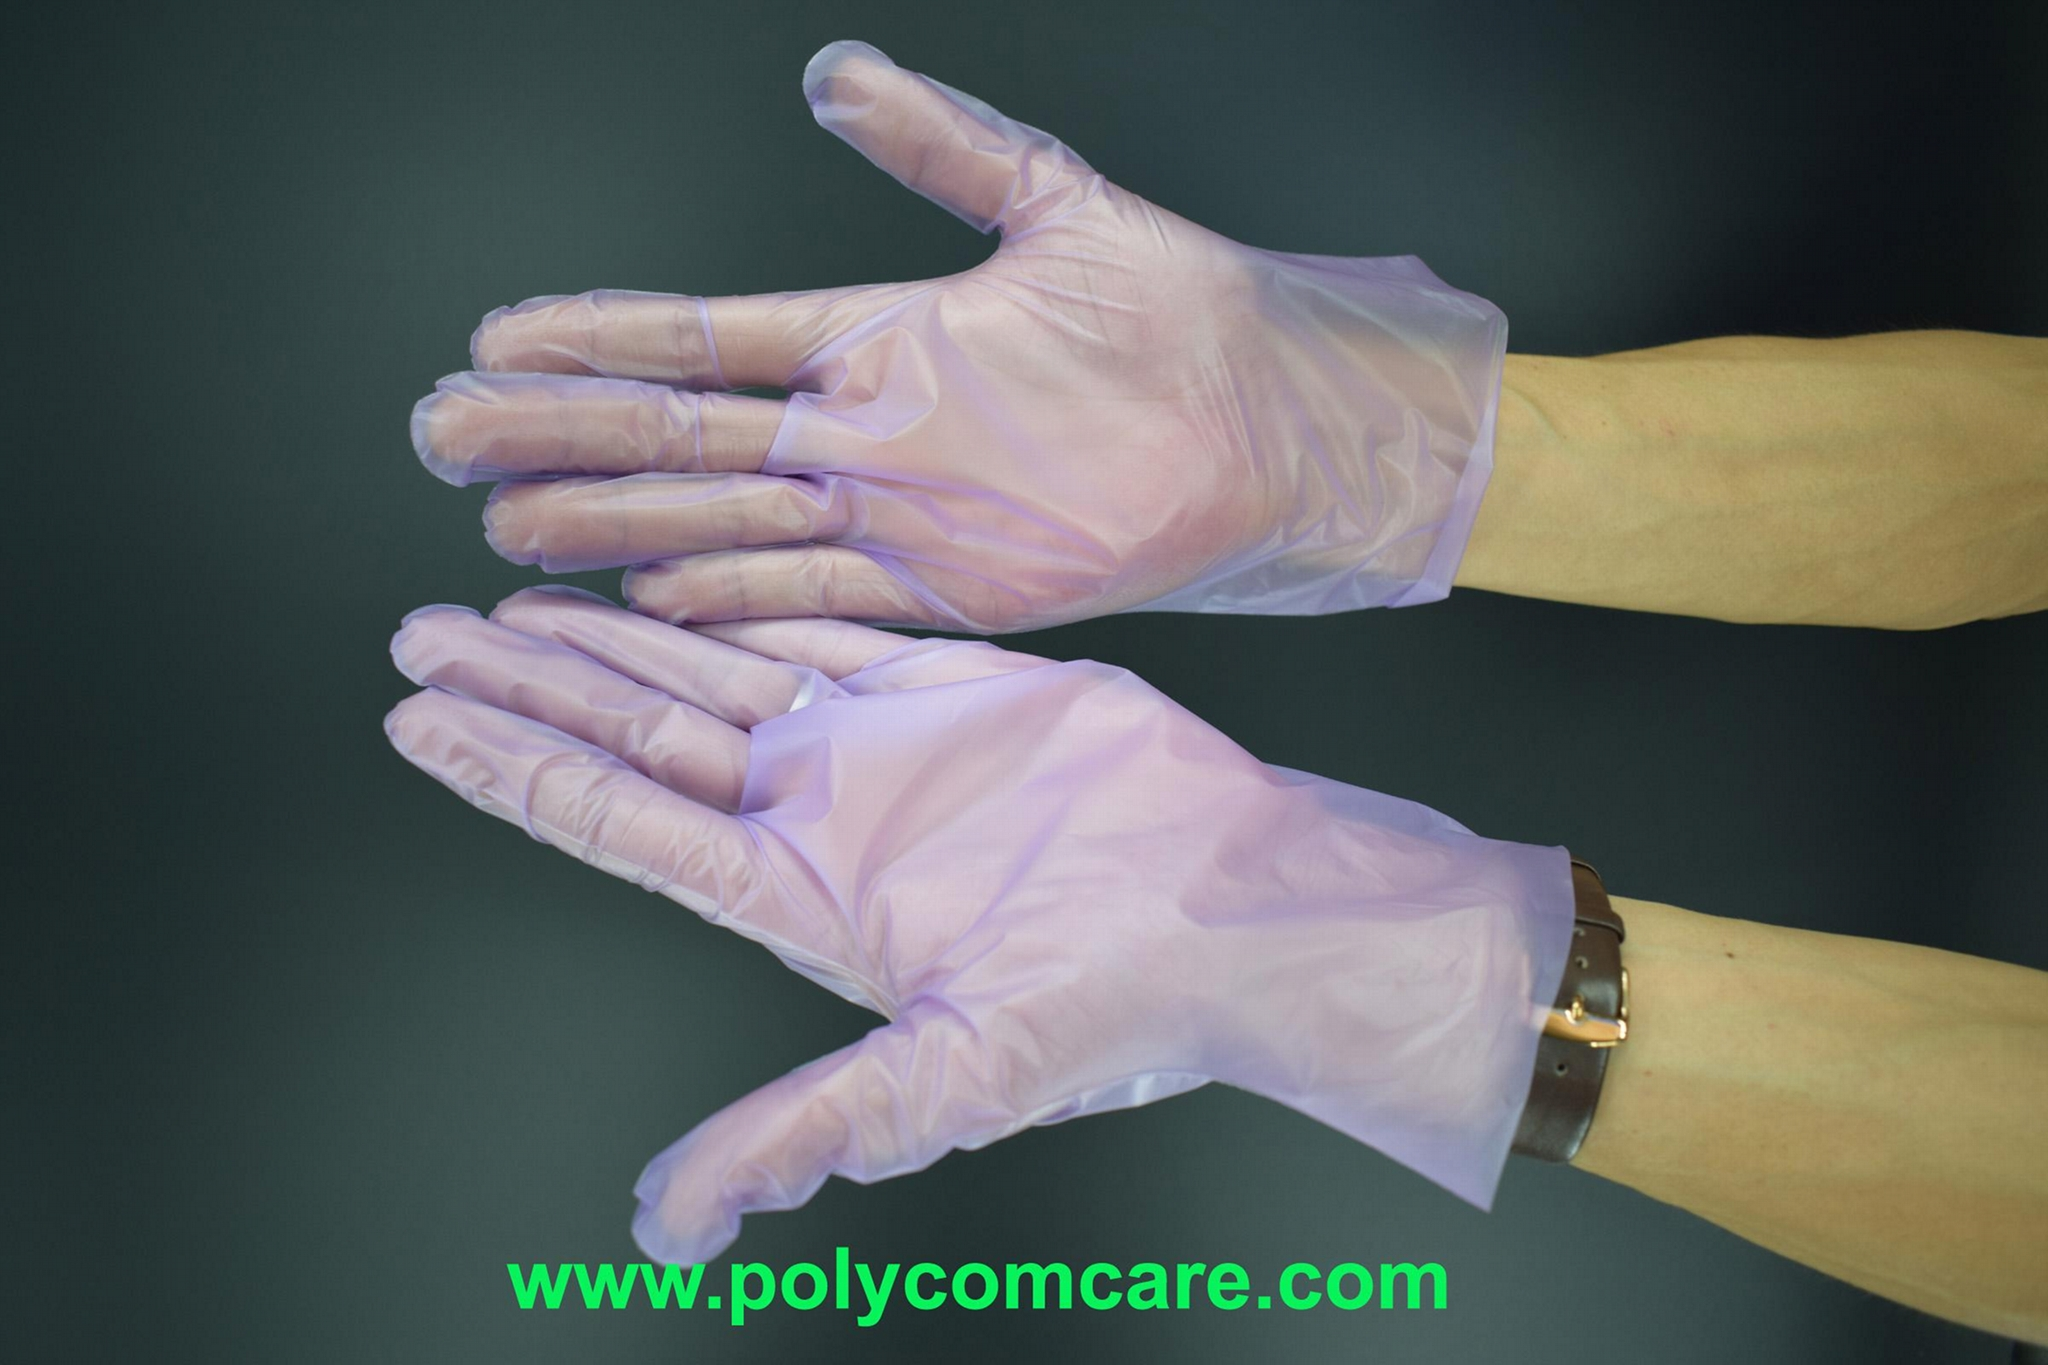 Thermoplastic Elastomer (TPE) Glove 5